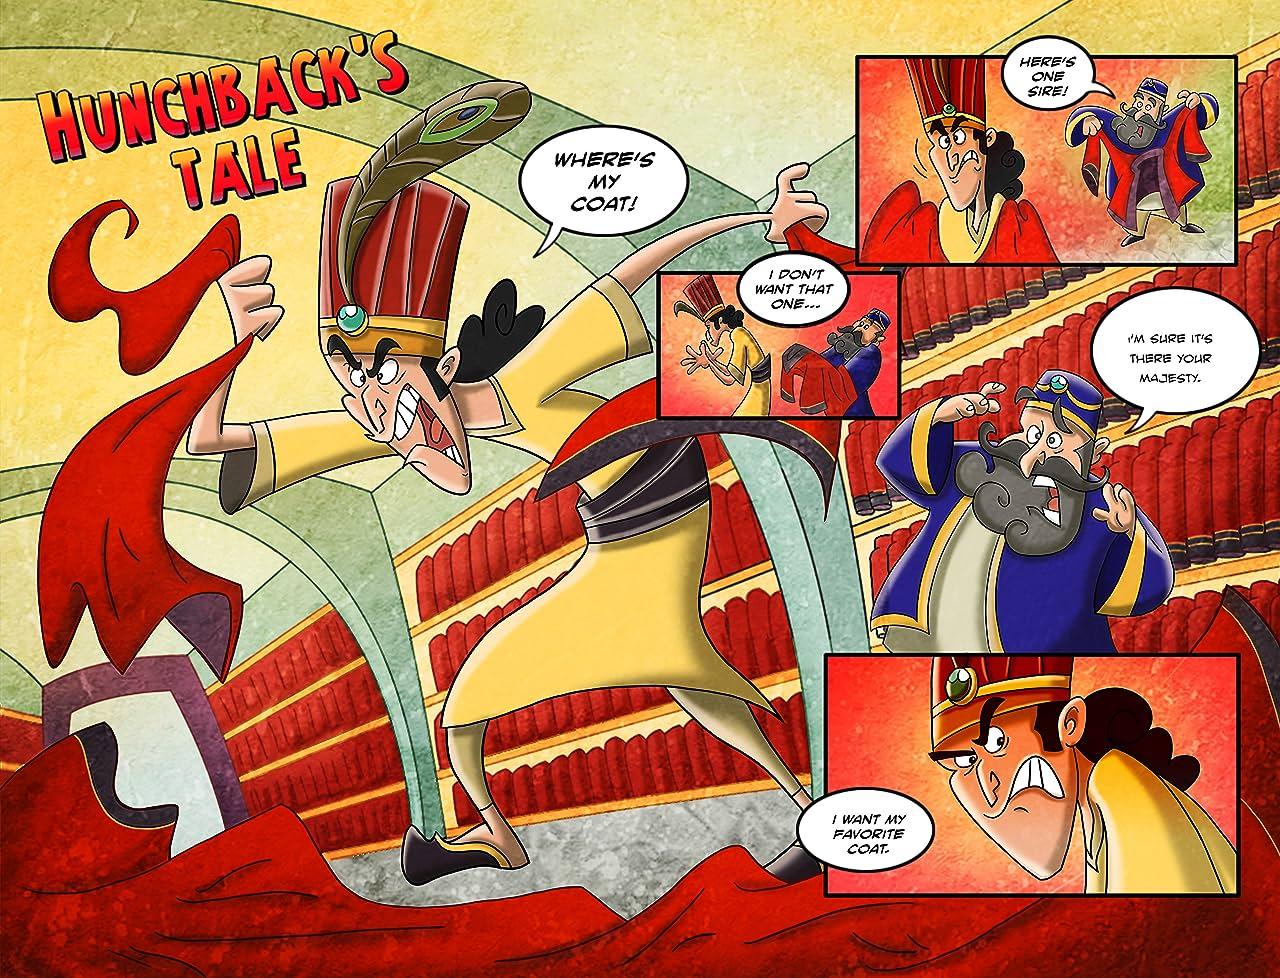 1001 Nights #5: Hunchback's Tale